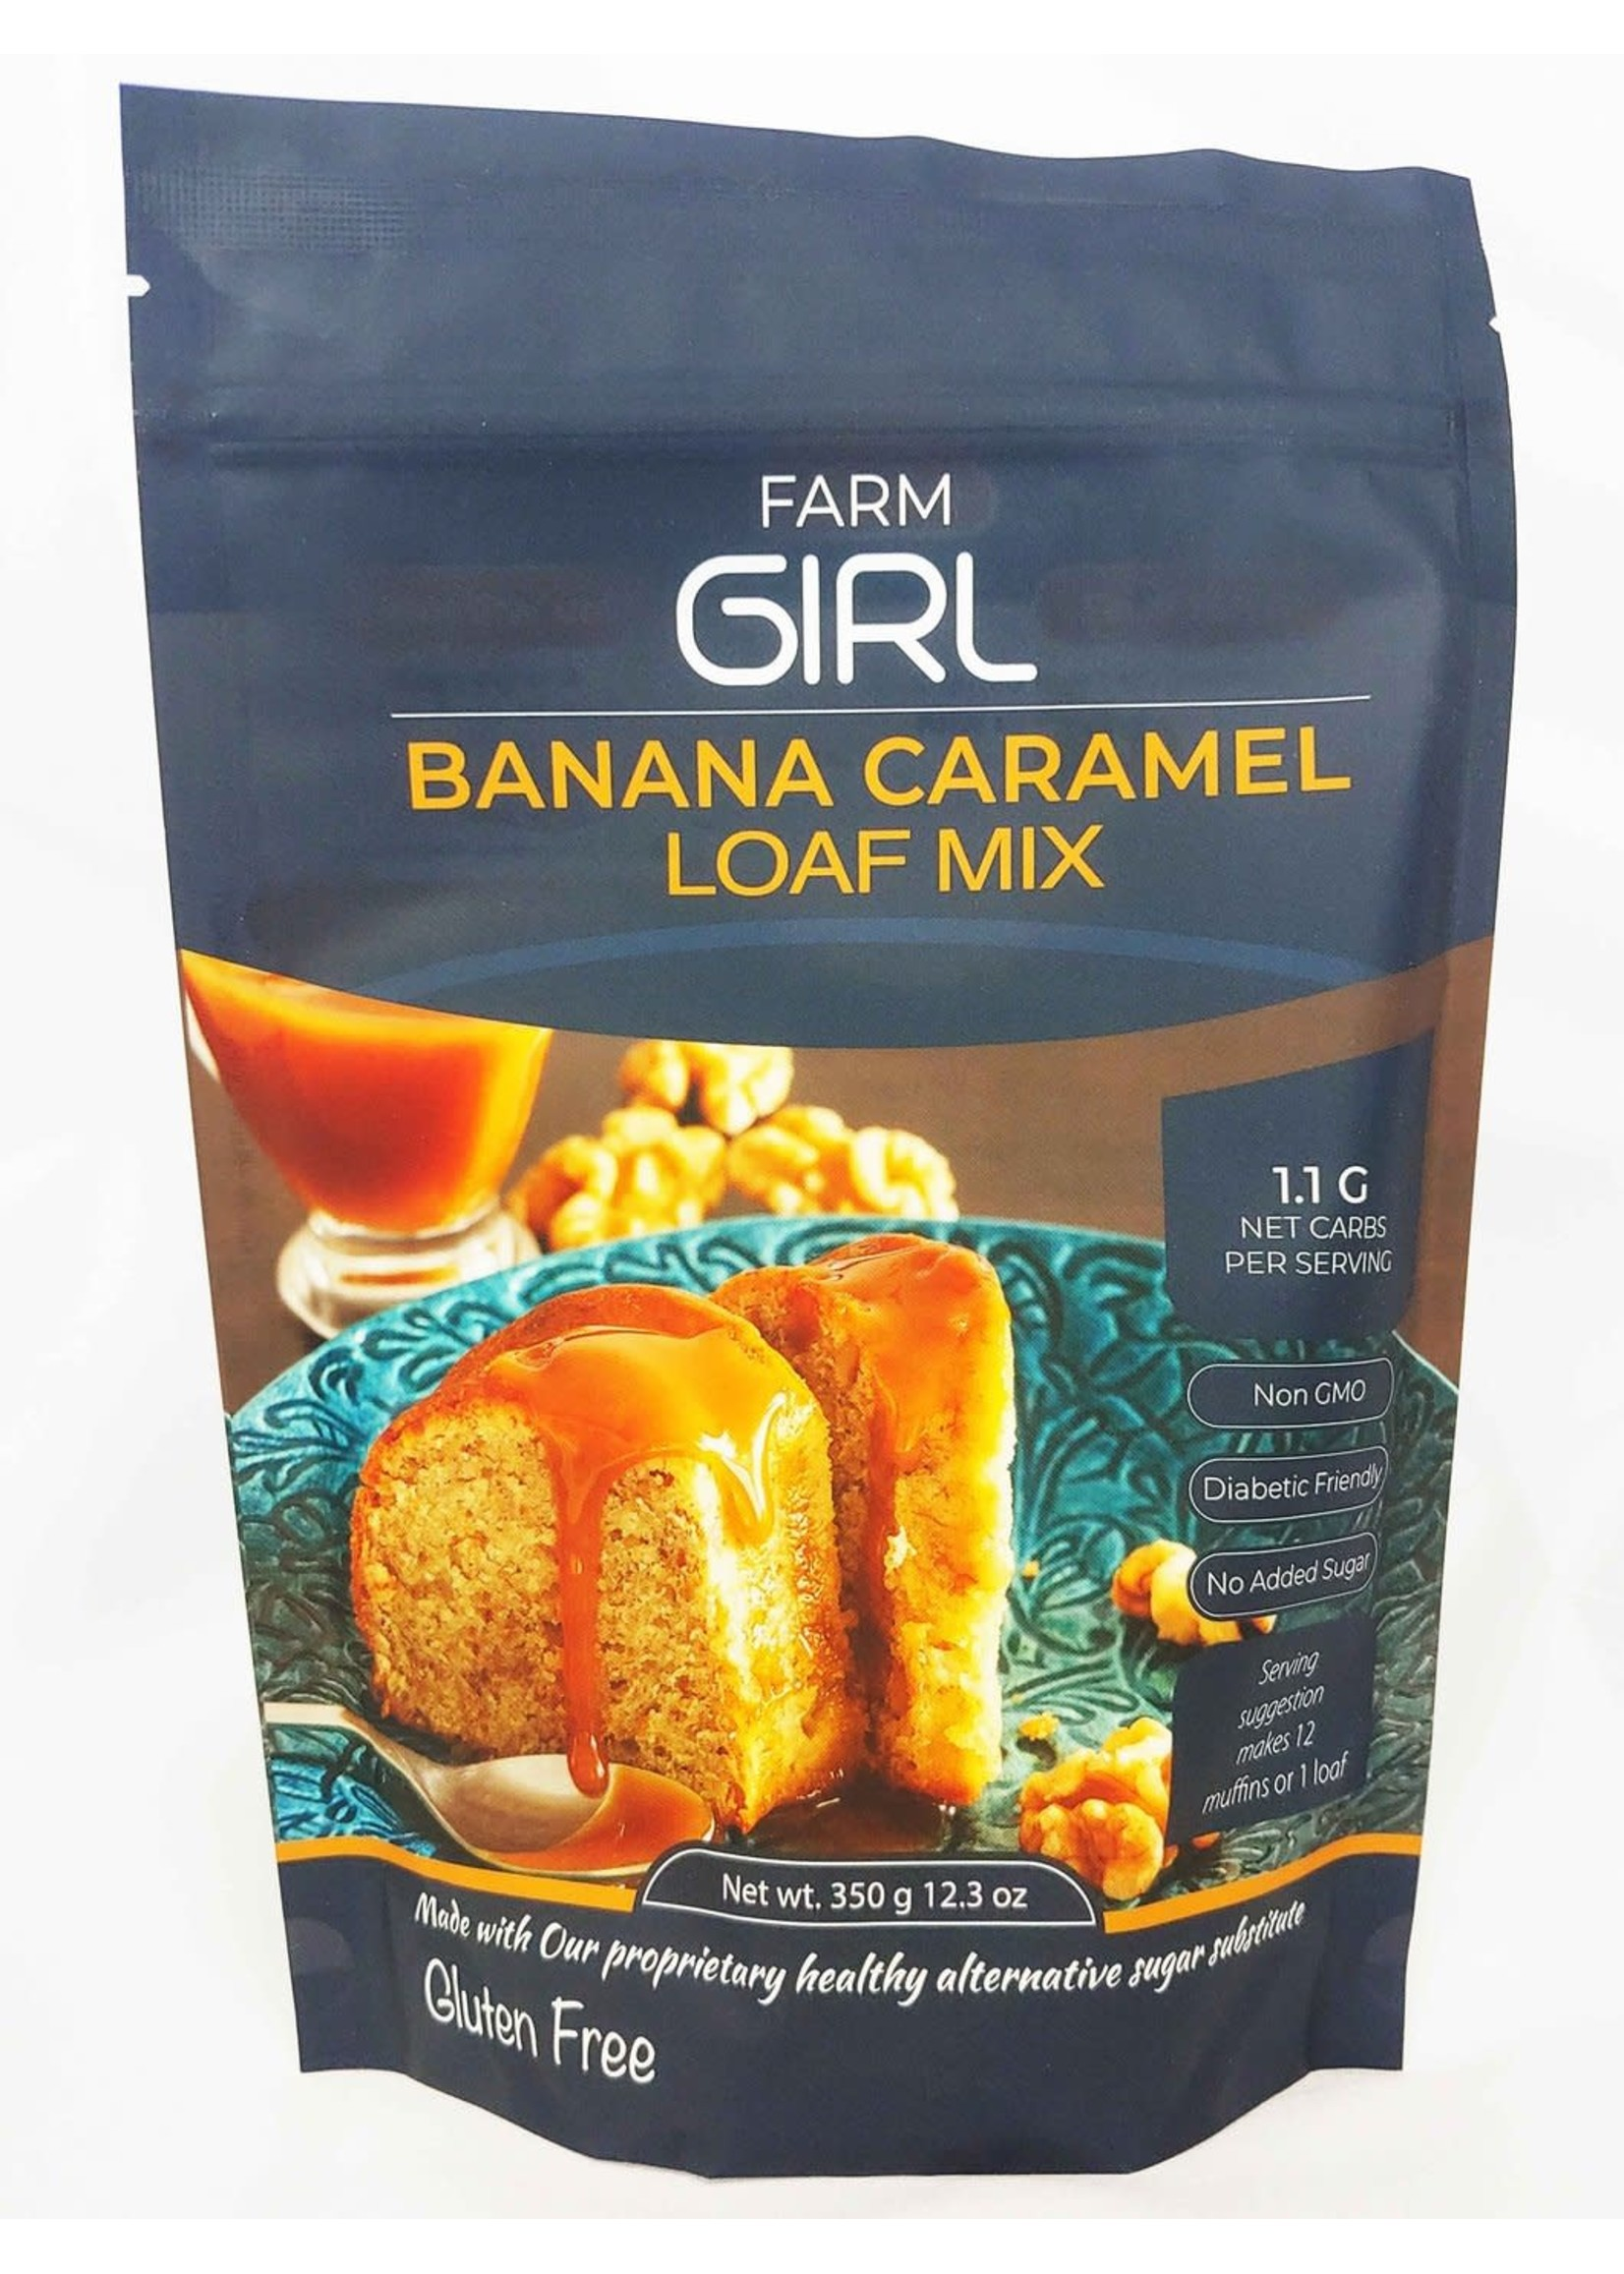 Farm Girl Farm Girl Keto Banana Caramel Loaf Mix